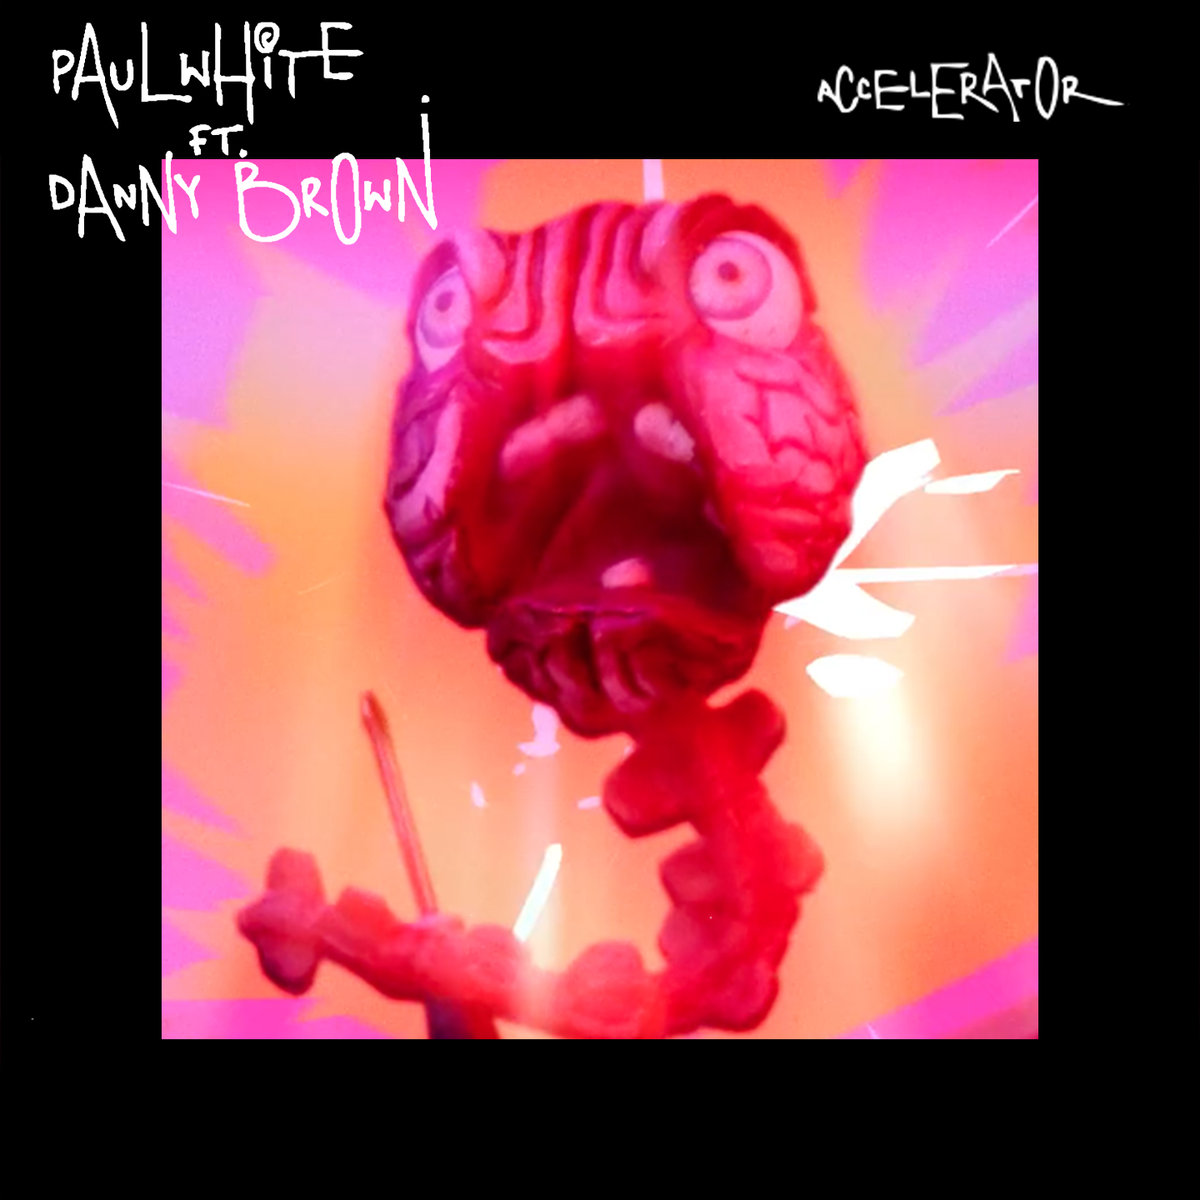 Danny Brown new EP Accelerator